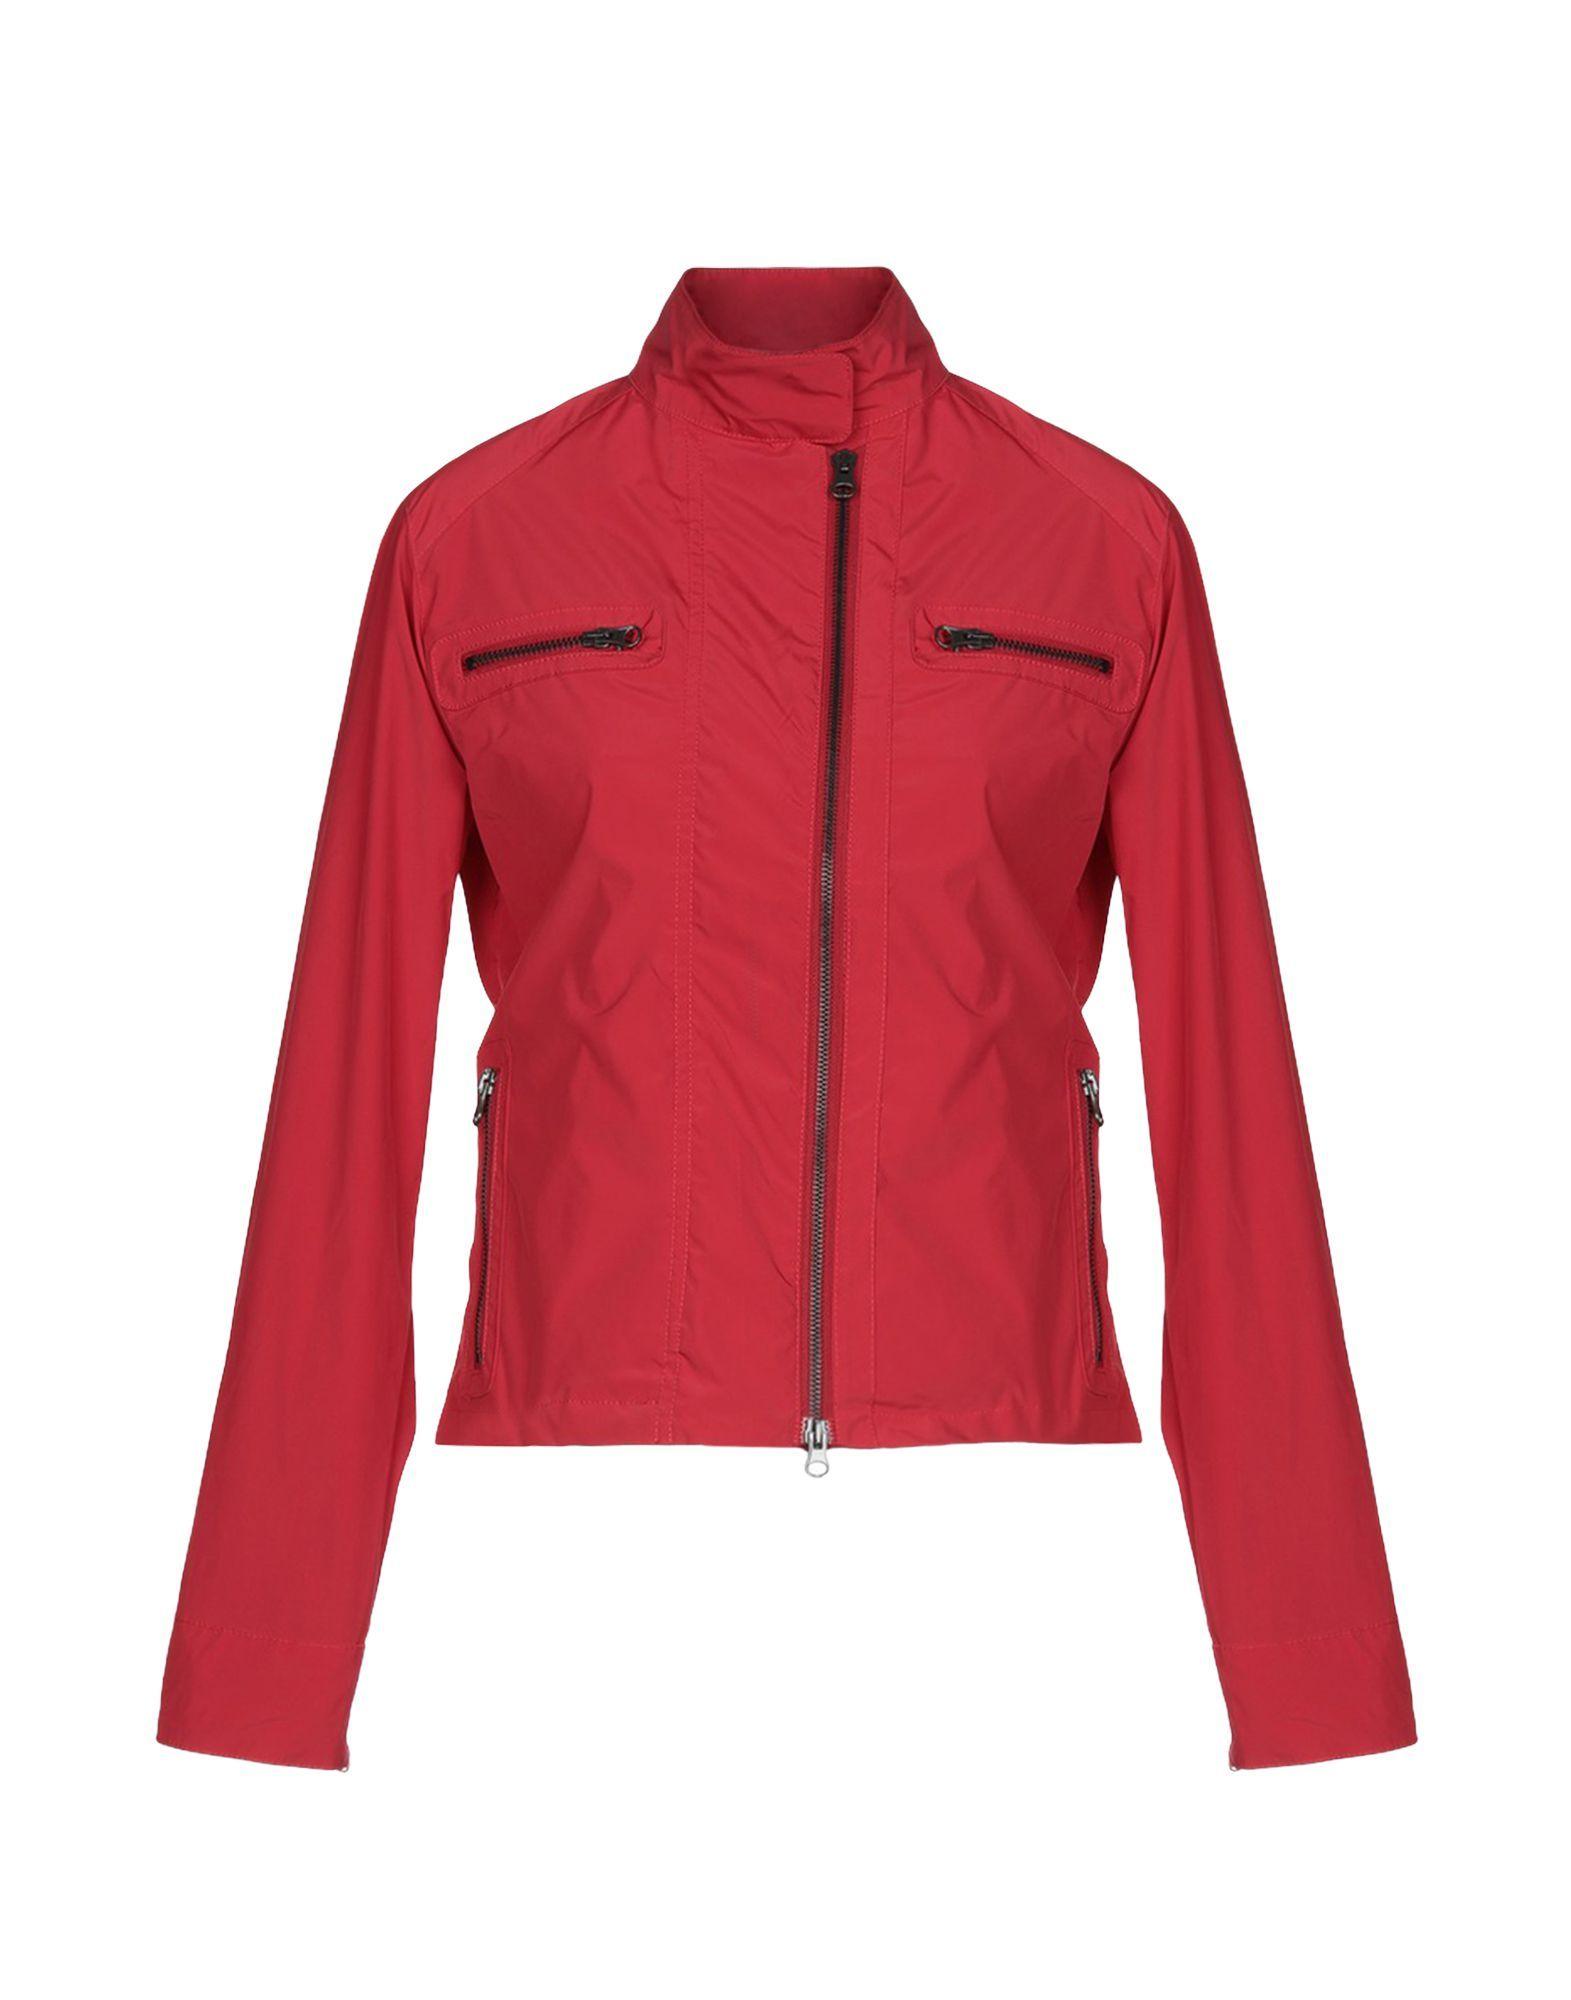 Aspesi Red Techno Fabric Jacket